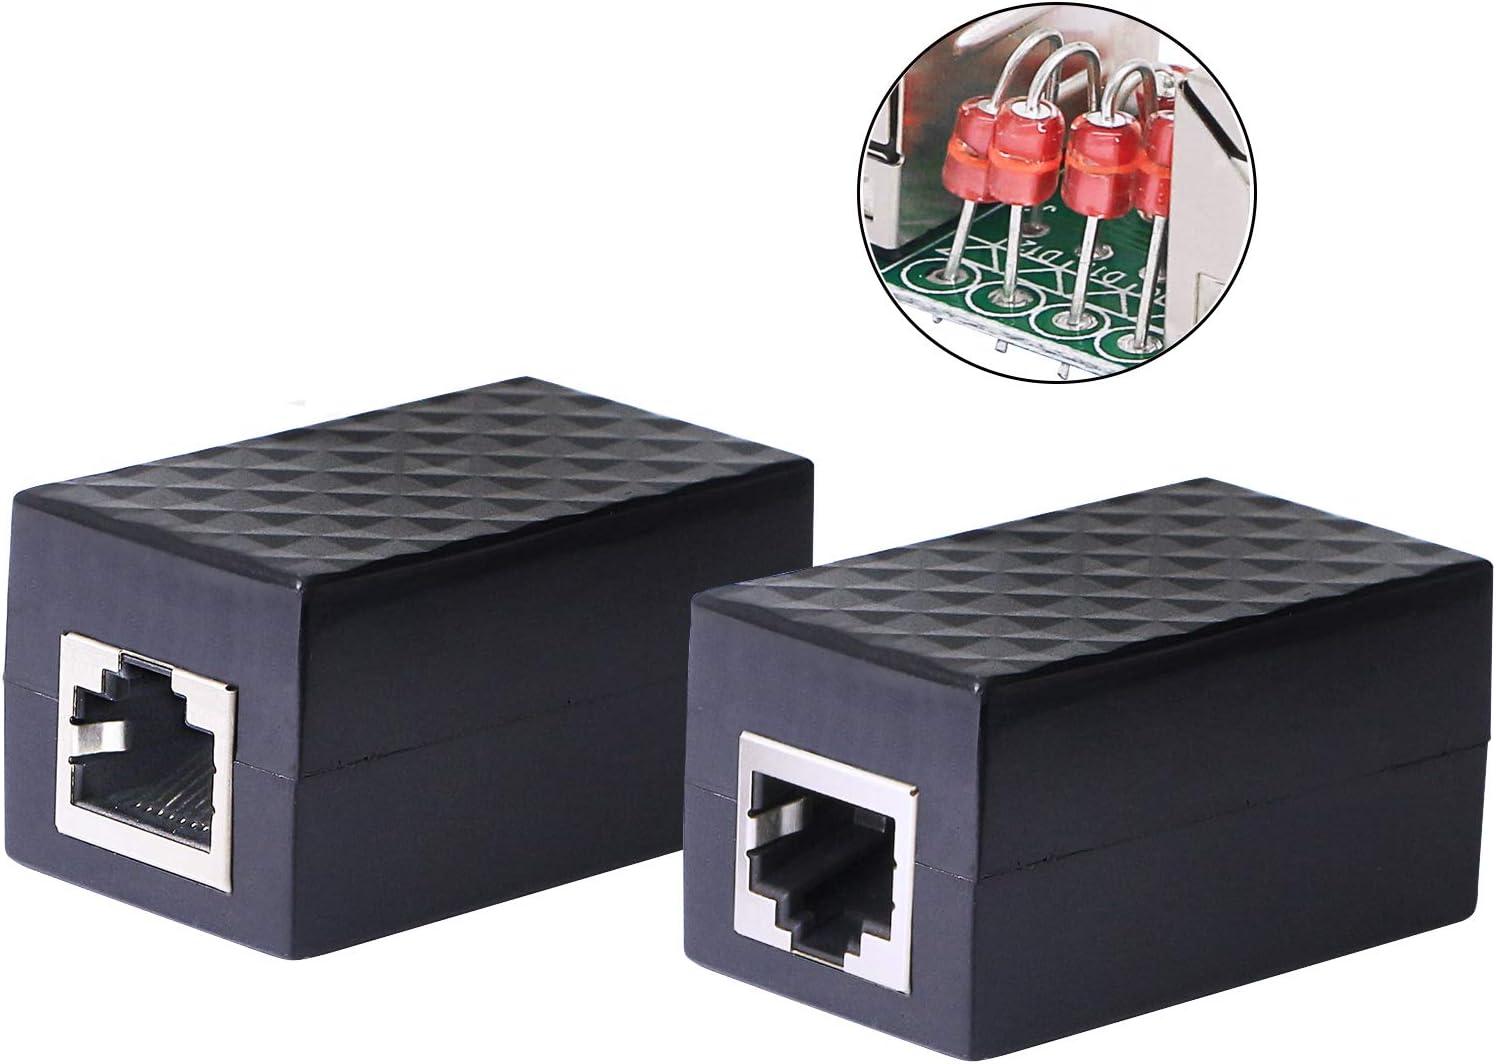 CERRXIAN Ethernet Surge Protector RJ45 Coupler Female to Female Network Surge Protector Outdoor Arrester